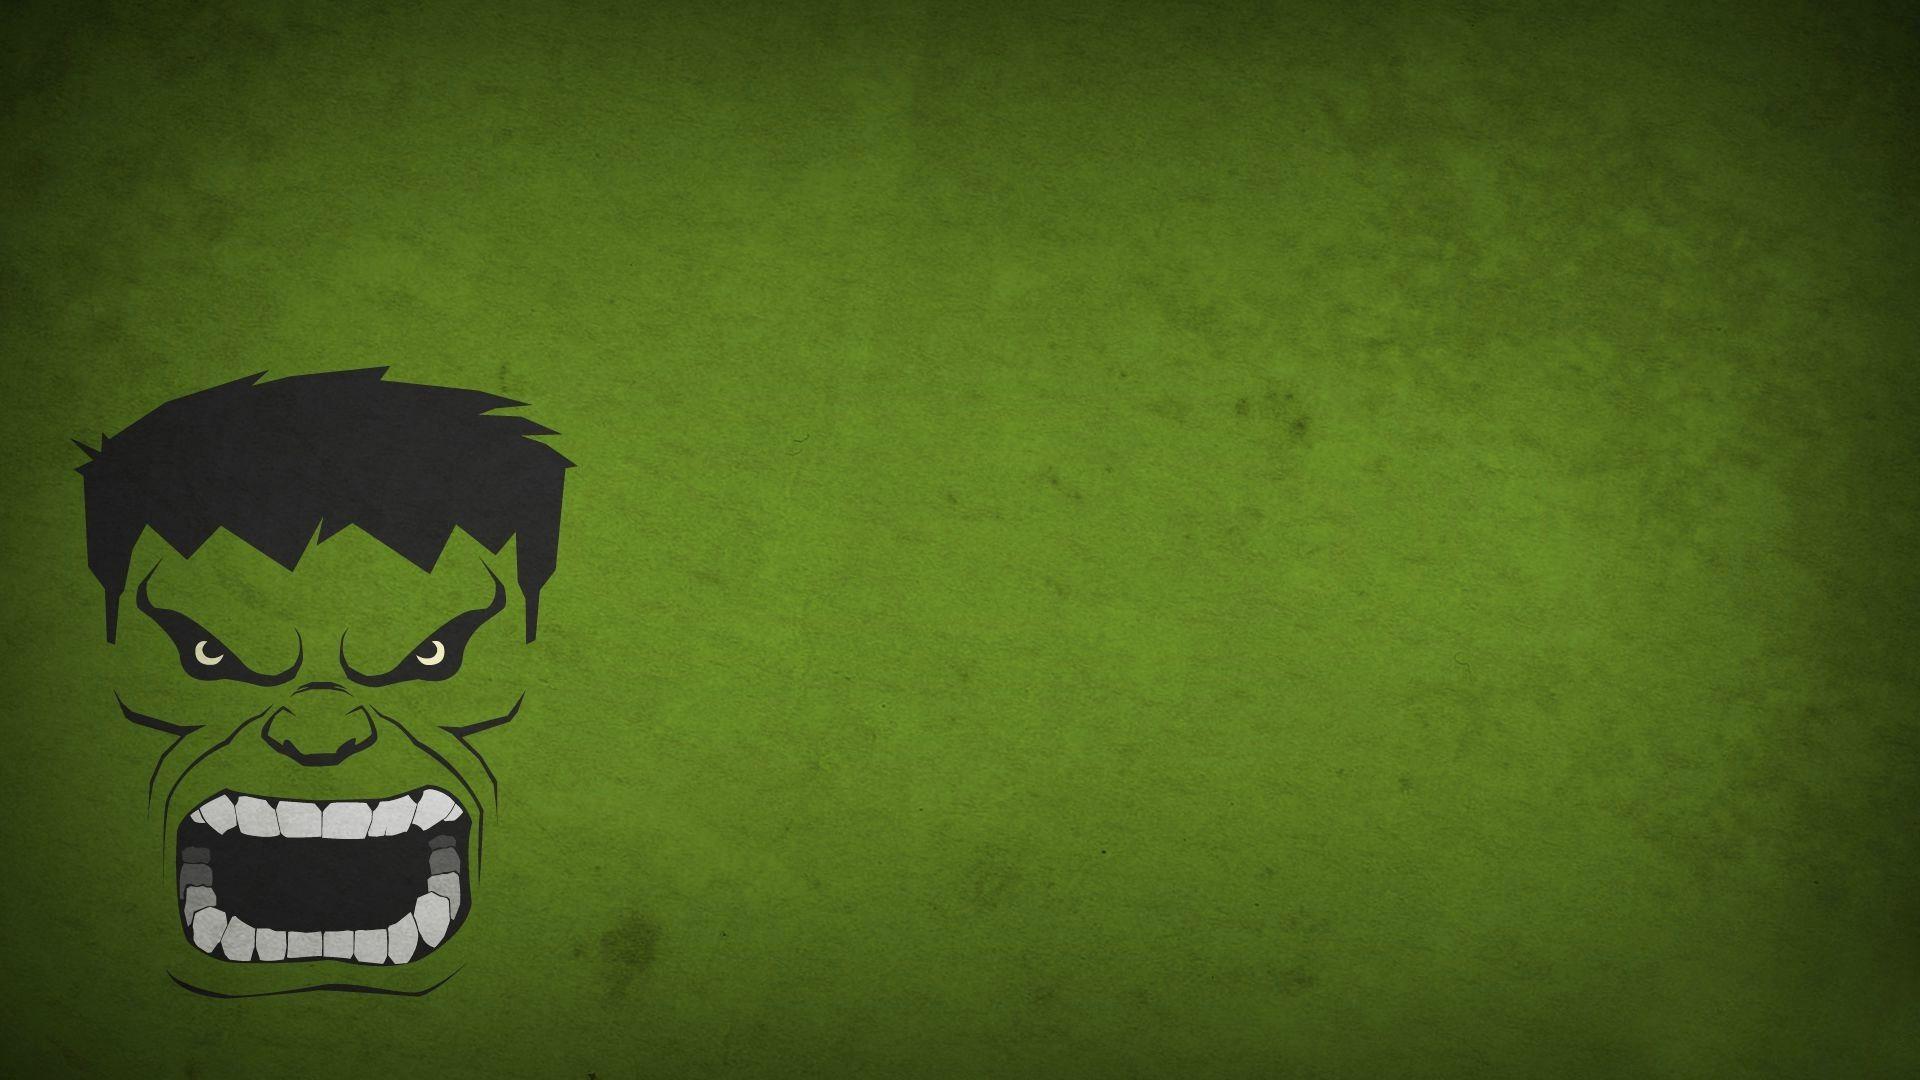 Download hulk images desktop wallpaper 02029 hulk - Hulk hd images free download ...